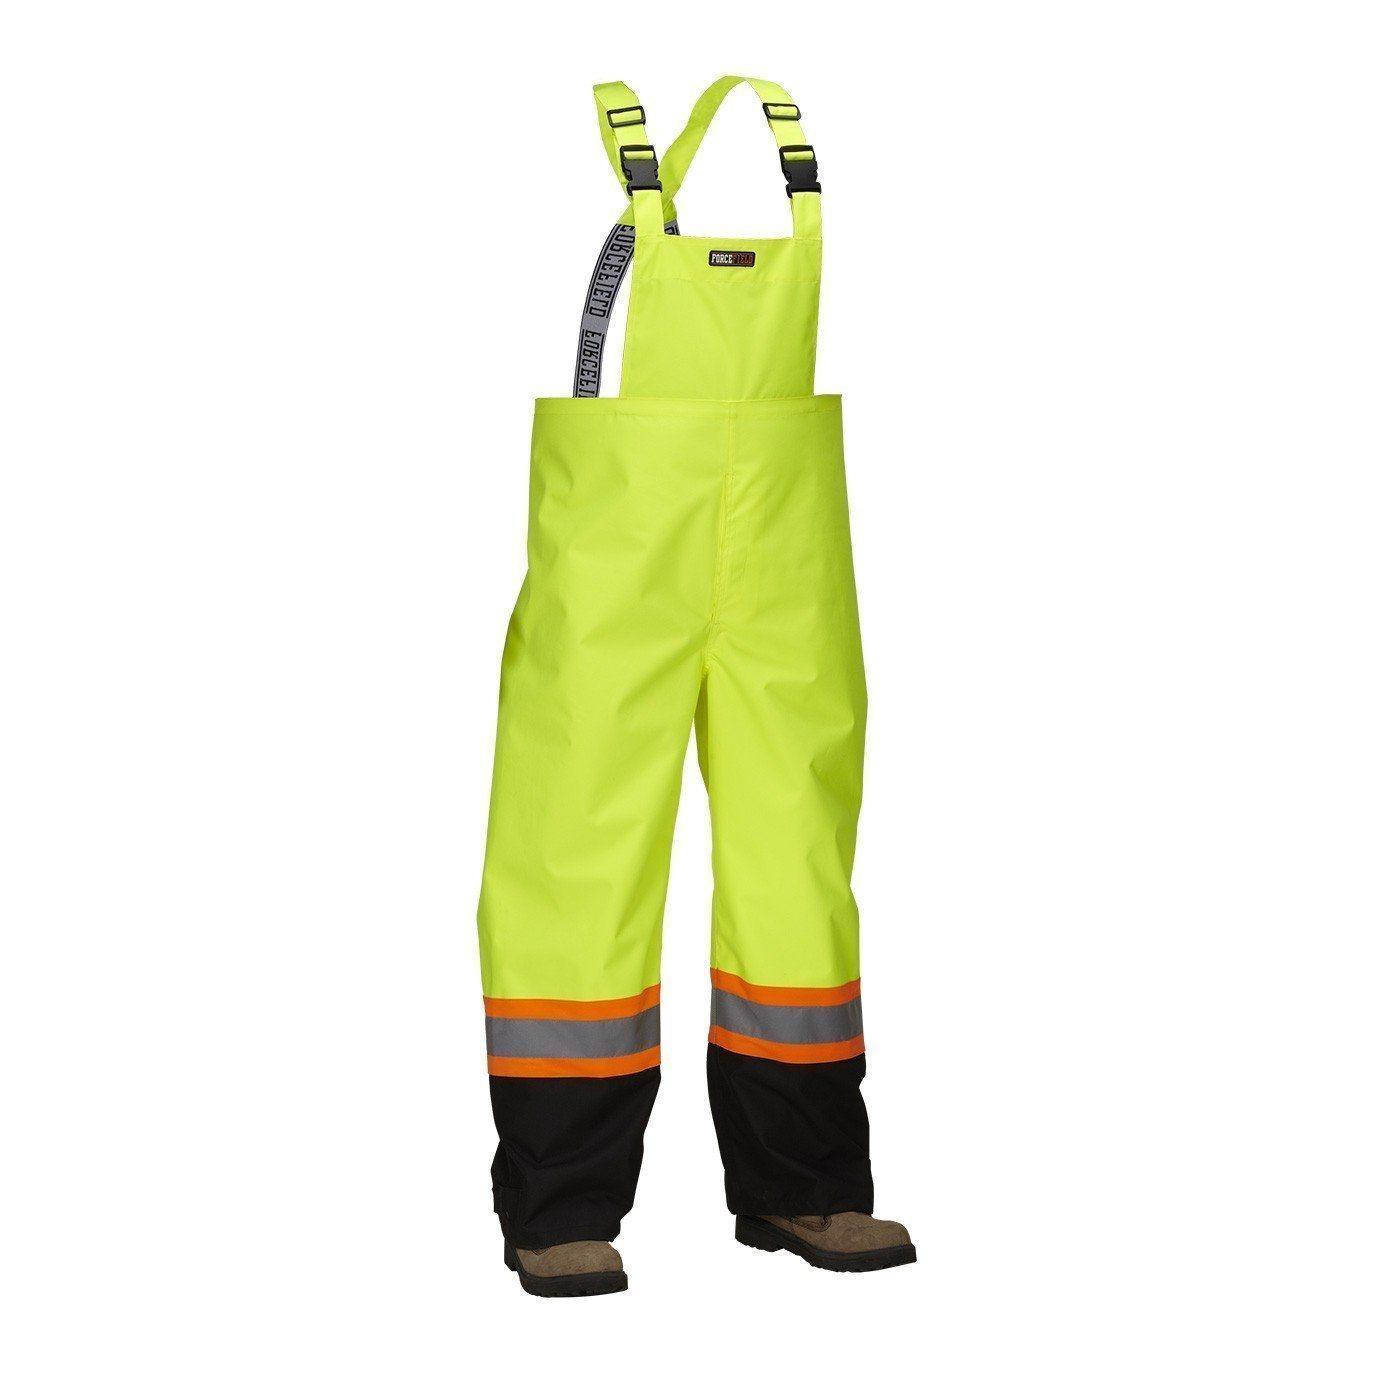 Forcefield Hi-Vis Safety Rain Overall 023-HVRBPLYT